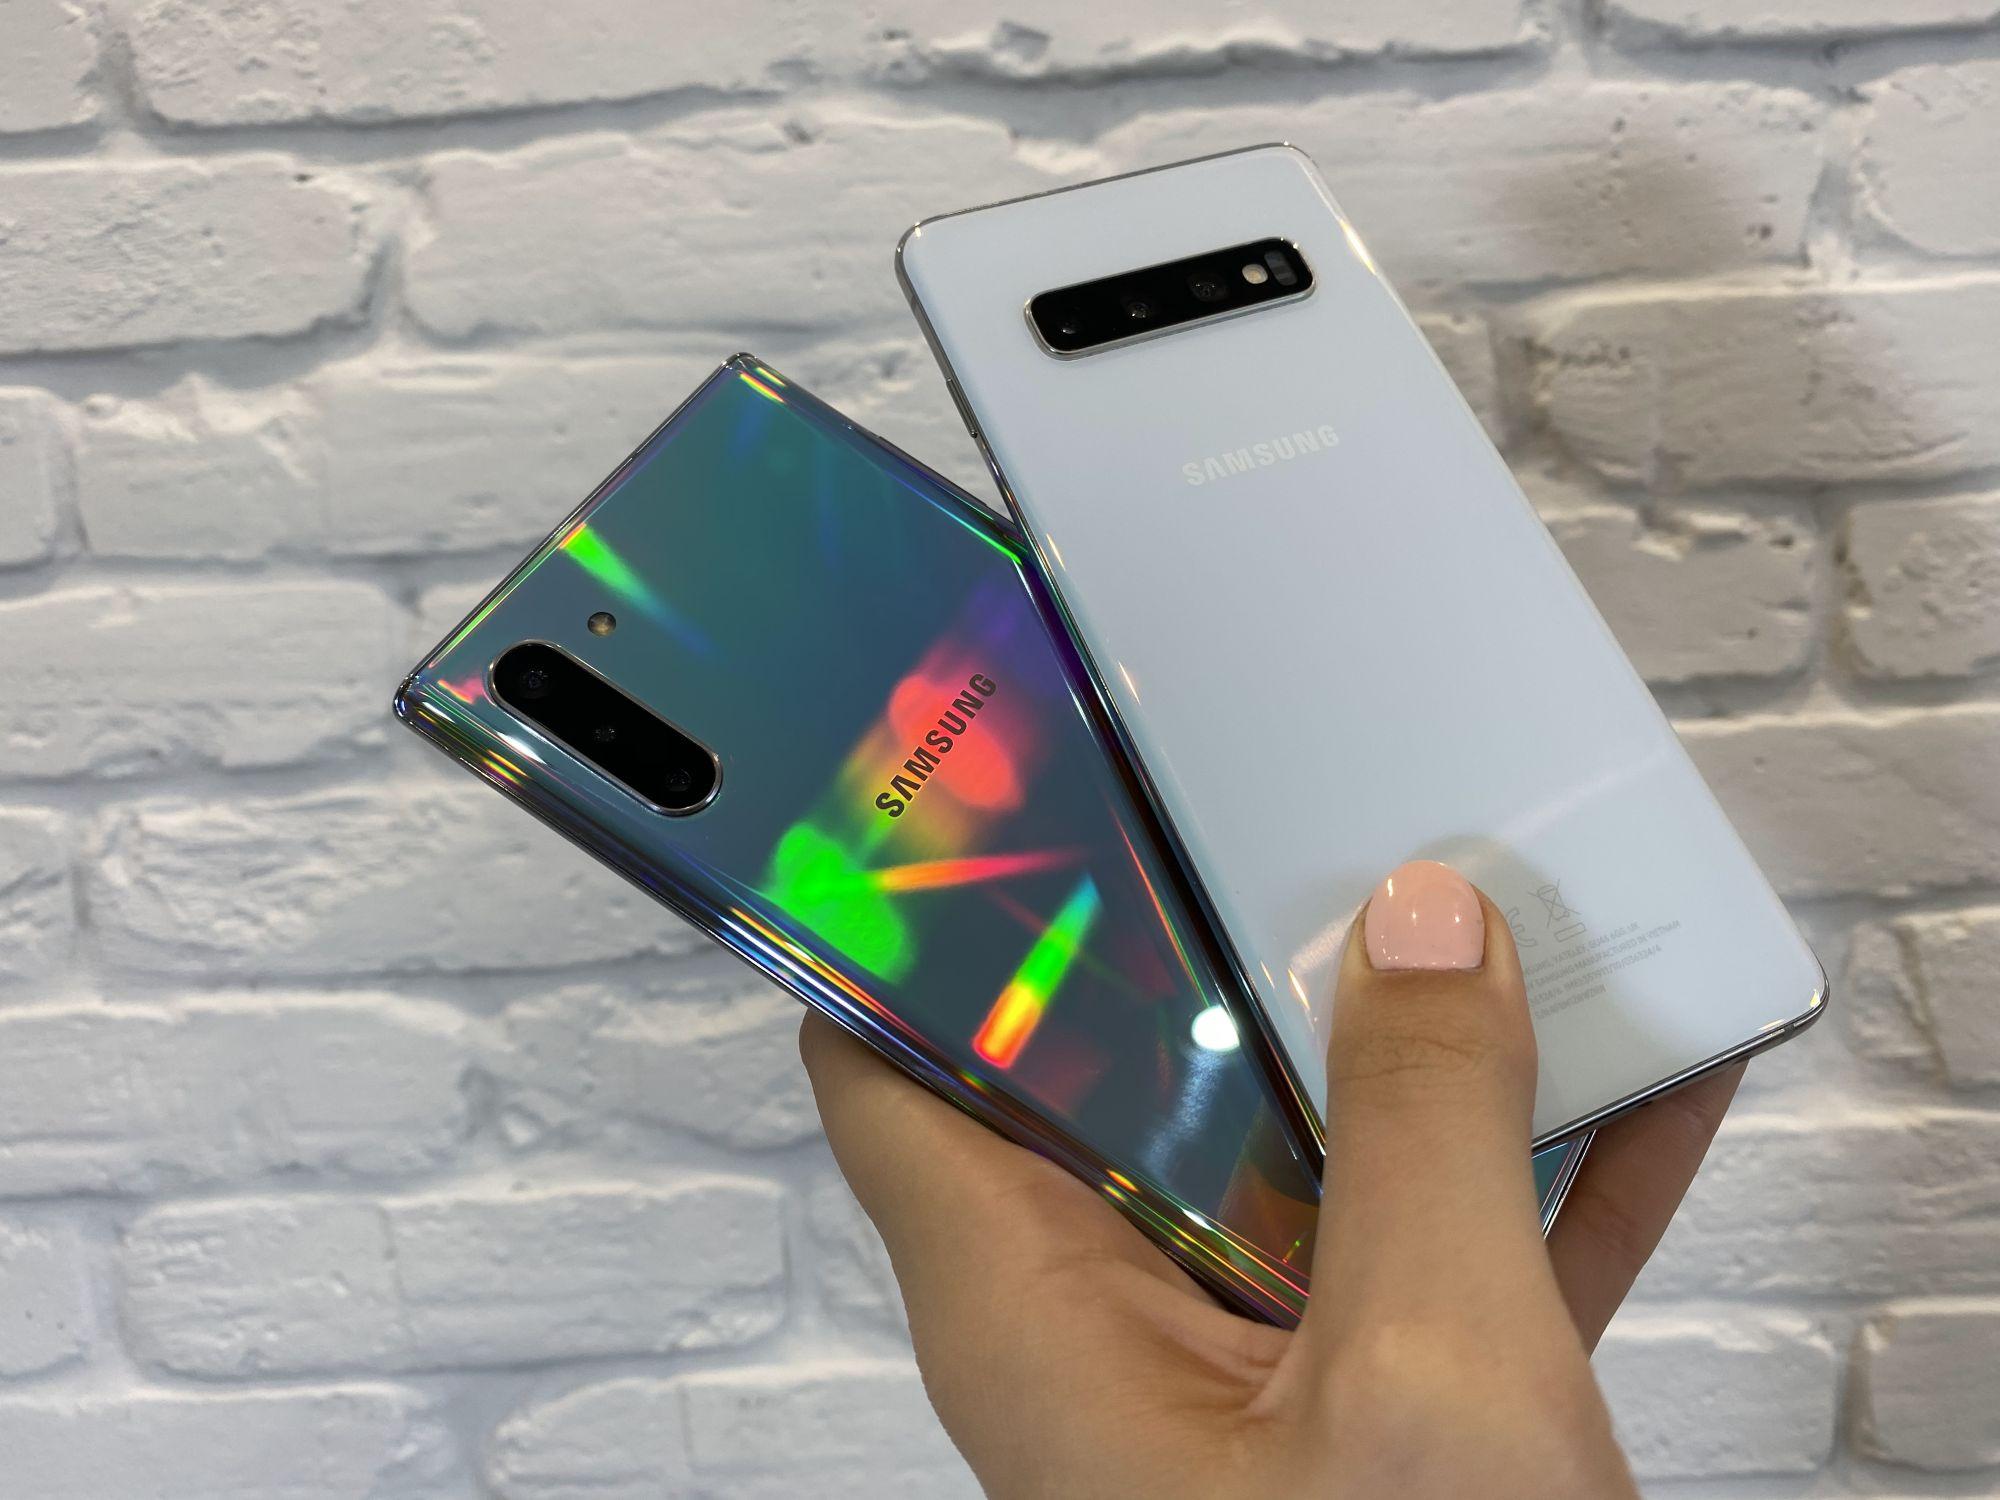 Samsung Galaxy Note 10 Galaxy S10+